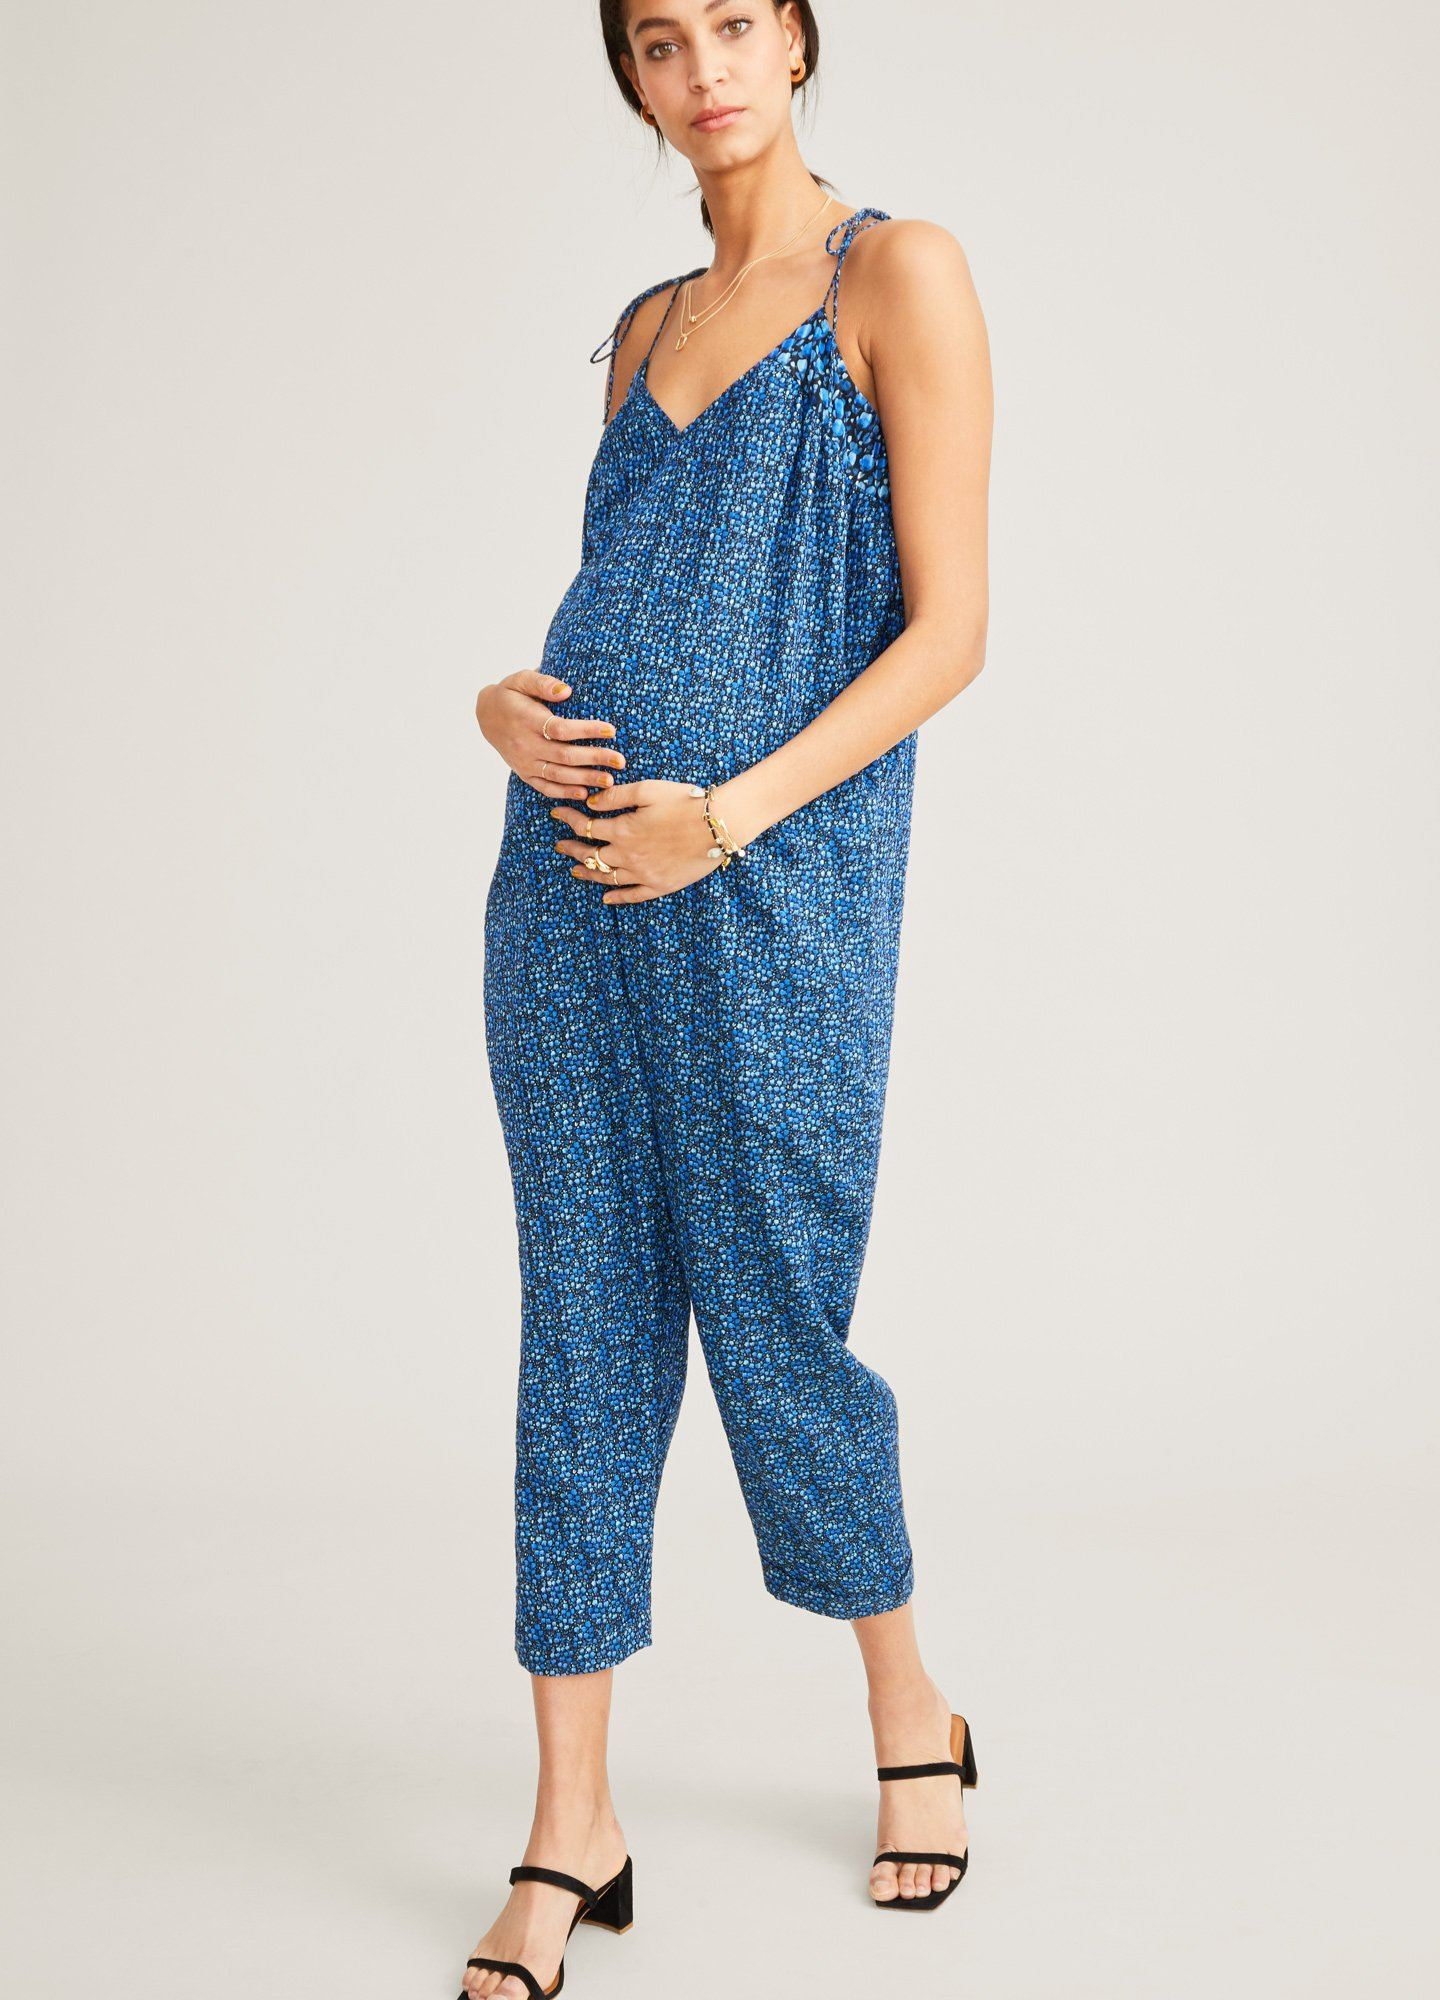 HATCH Maternity The Kacey Jumpsuit, Twilight, Size 0